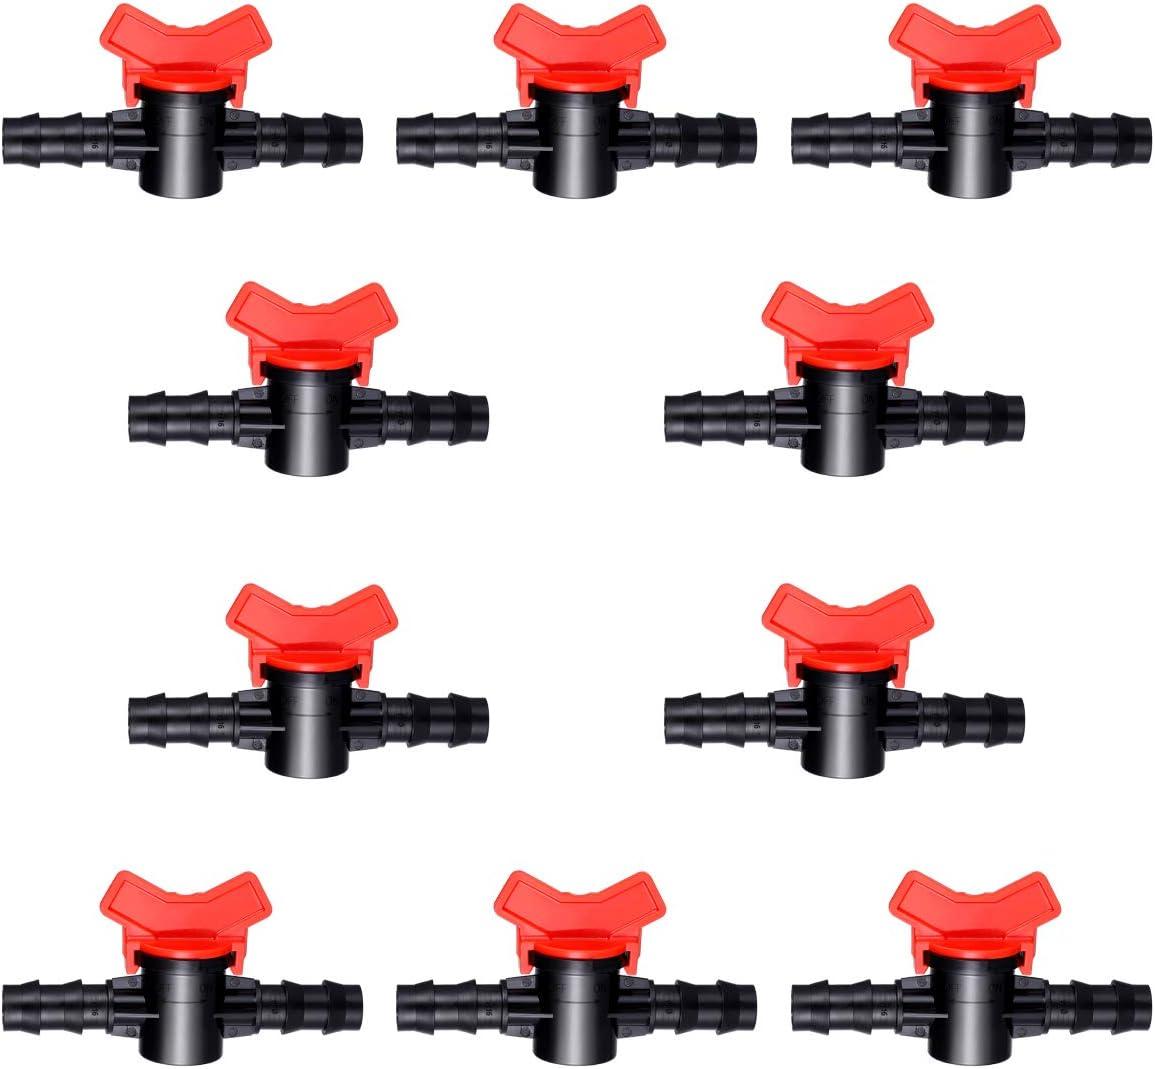 Yardwe 10 Pack Drip Irrigation Barbed Ball Valve 16mm 1/2 Inch Drip Irrigation Tubing Shut-Off Valve Drip Irrigation Parts